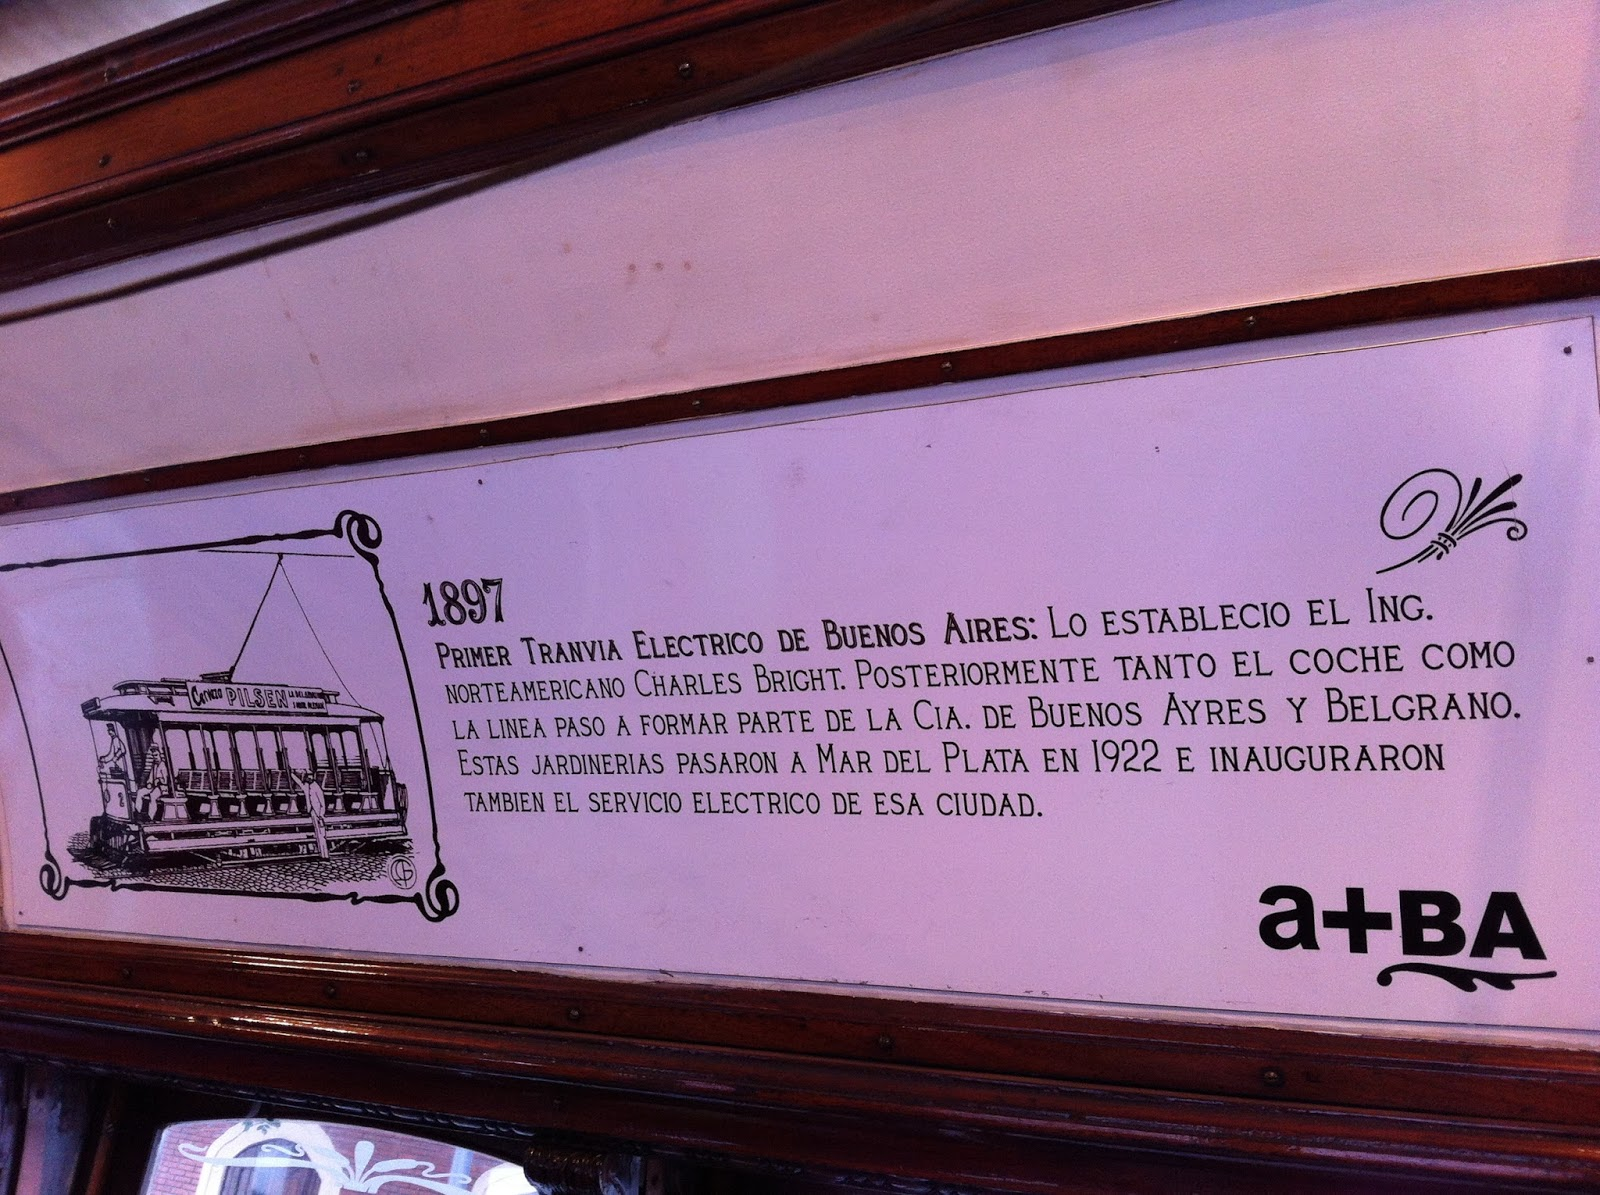 FERIADO EM LA PLATA E REPÚBLICA DE LOS NIÑOS  b18c4d5ee8b